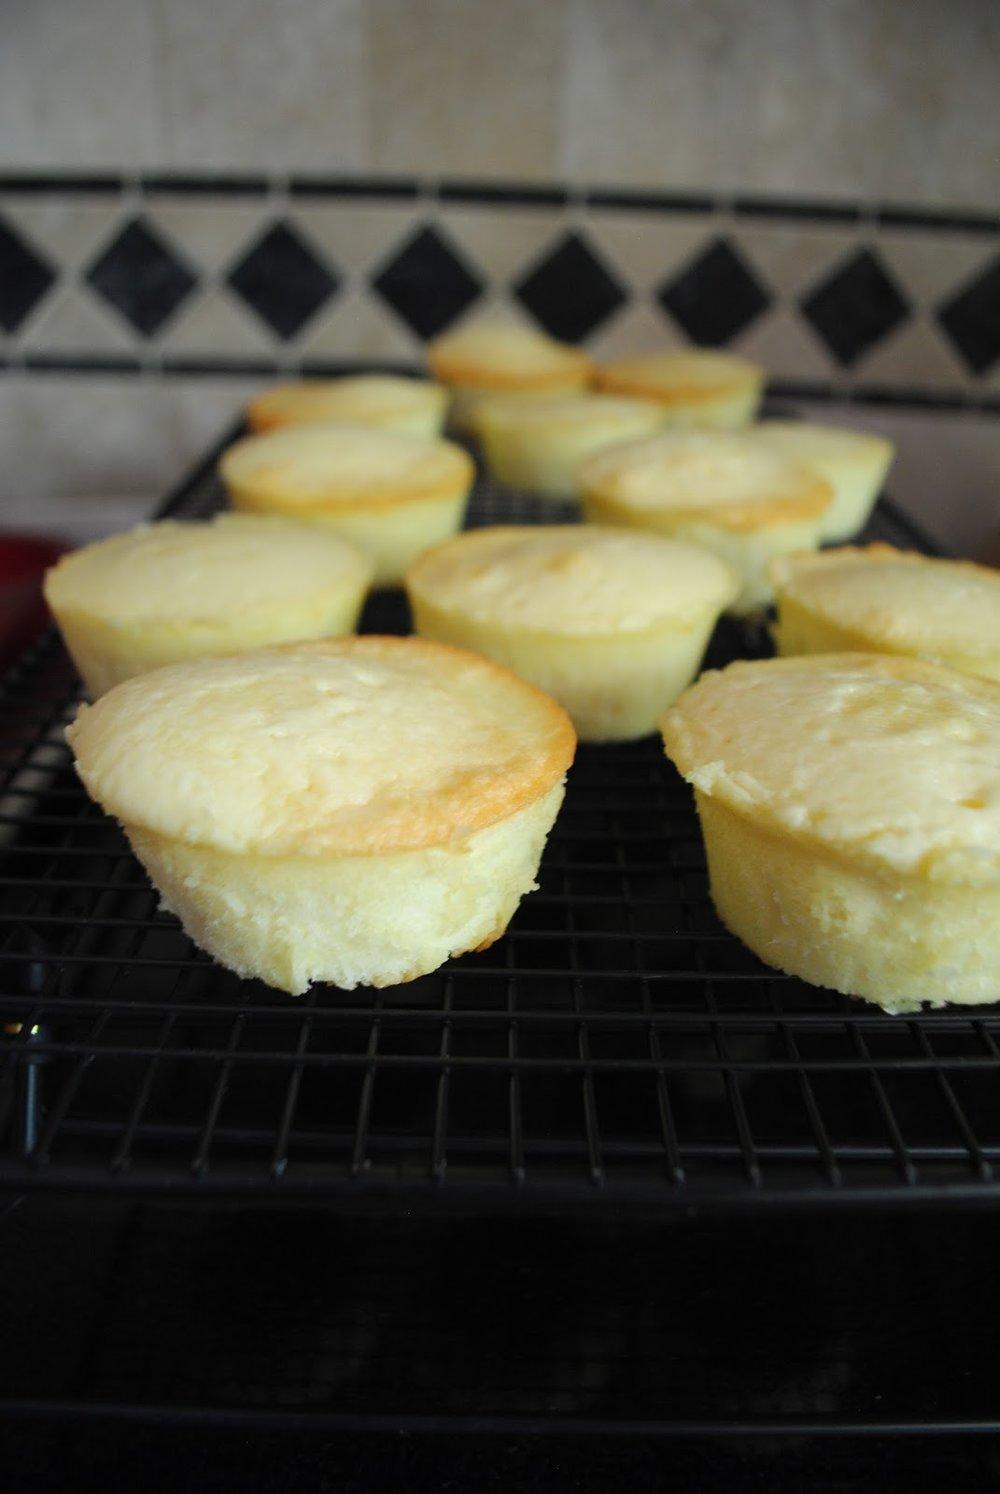 Naked Pound Cake Cupcakes 203 Yumlington Place